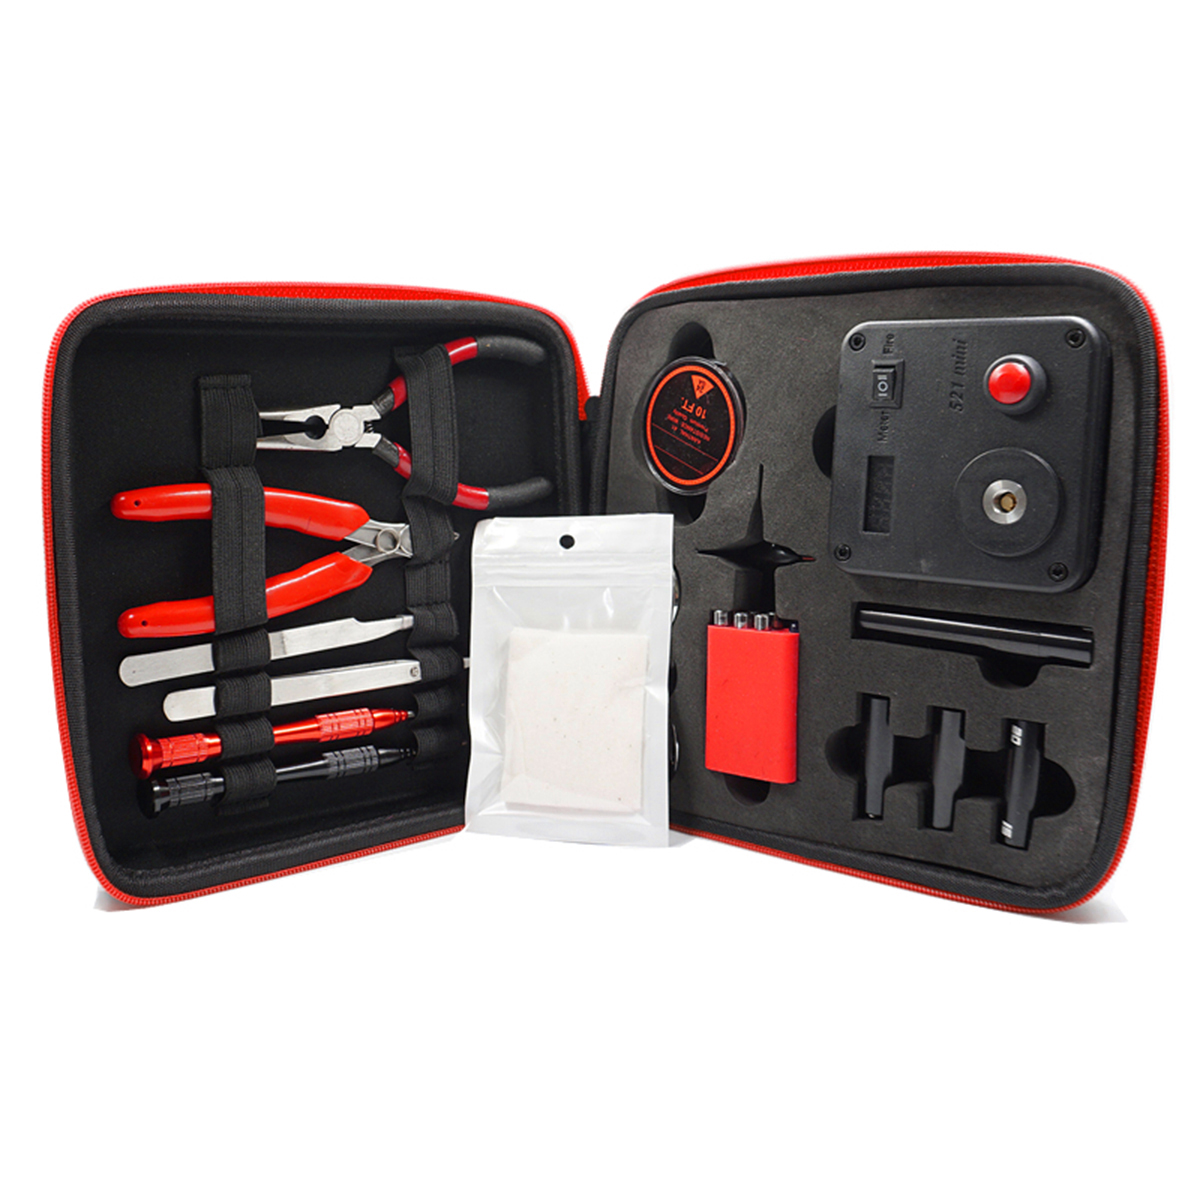 Coil Master V3 VAPE Tool DIY Kit Accessories Combo Set